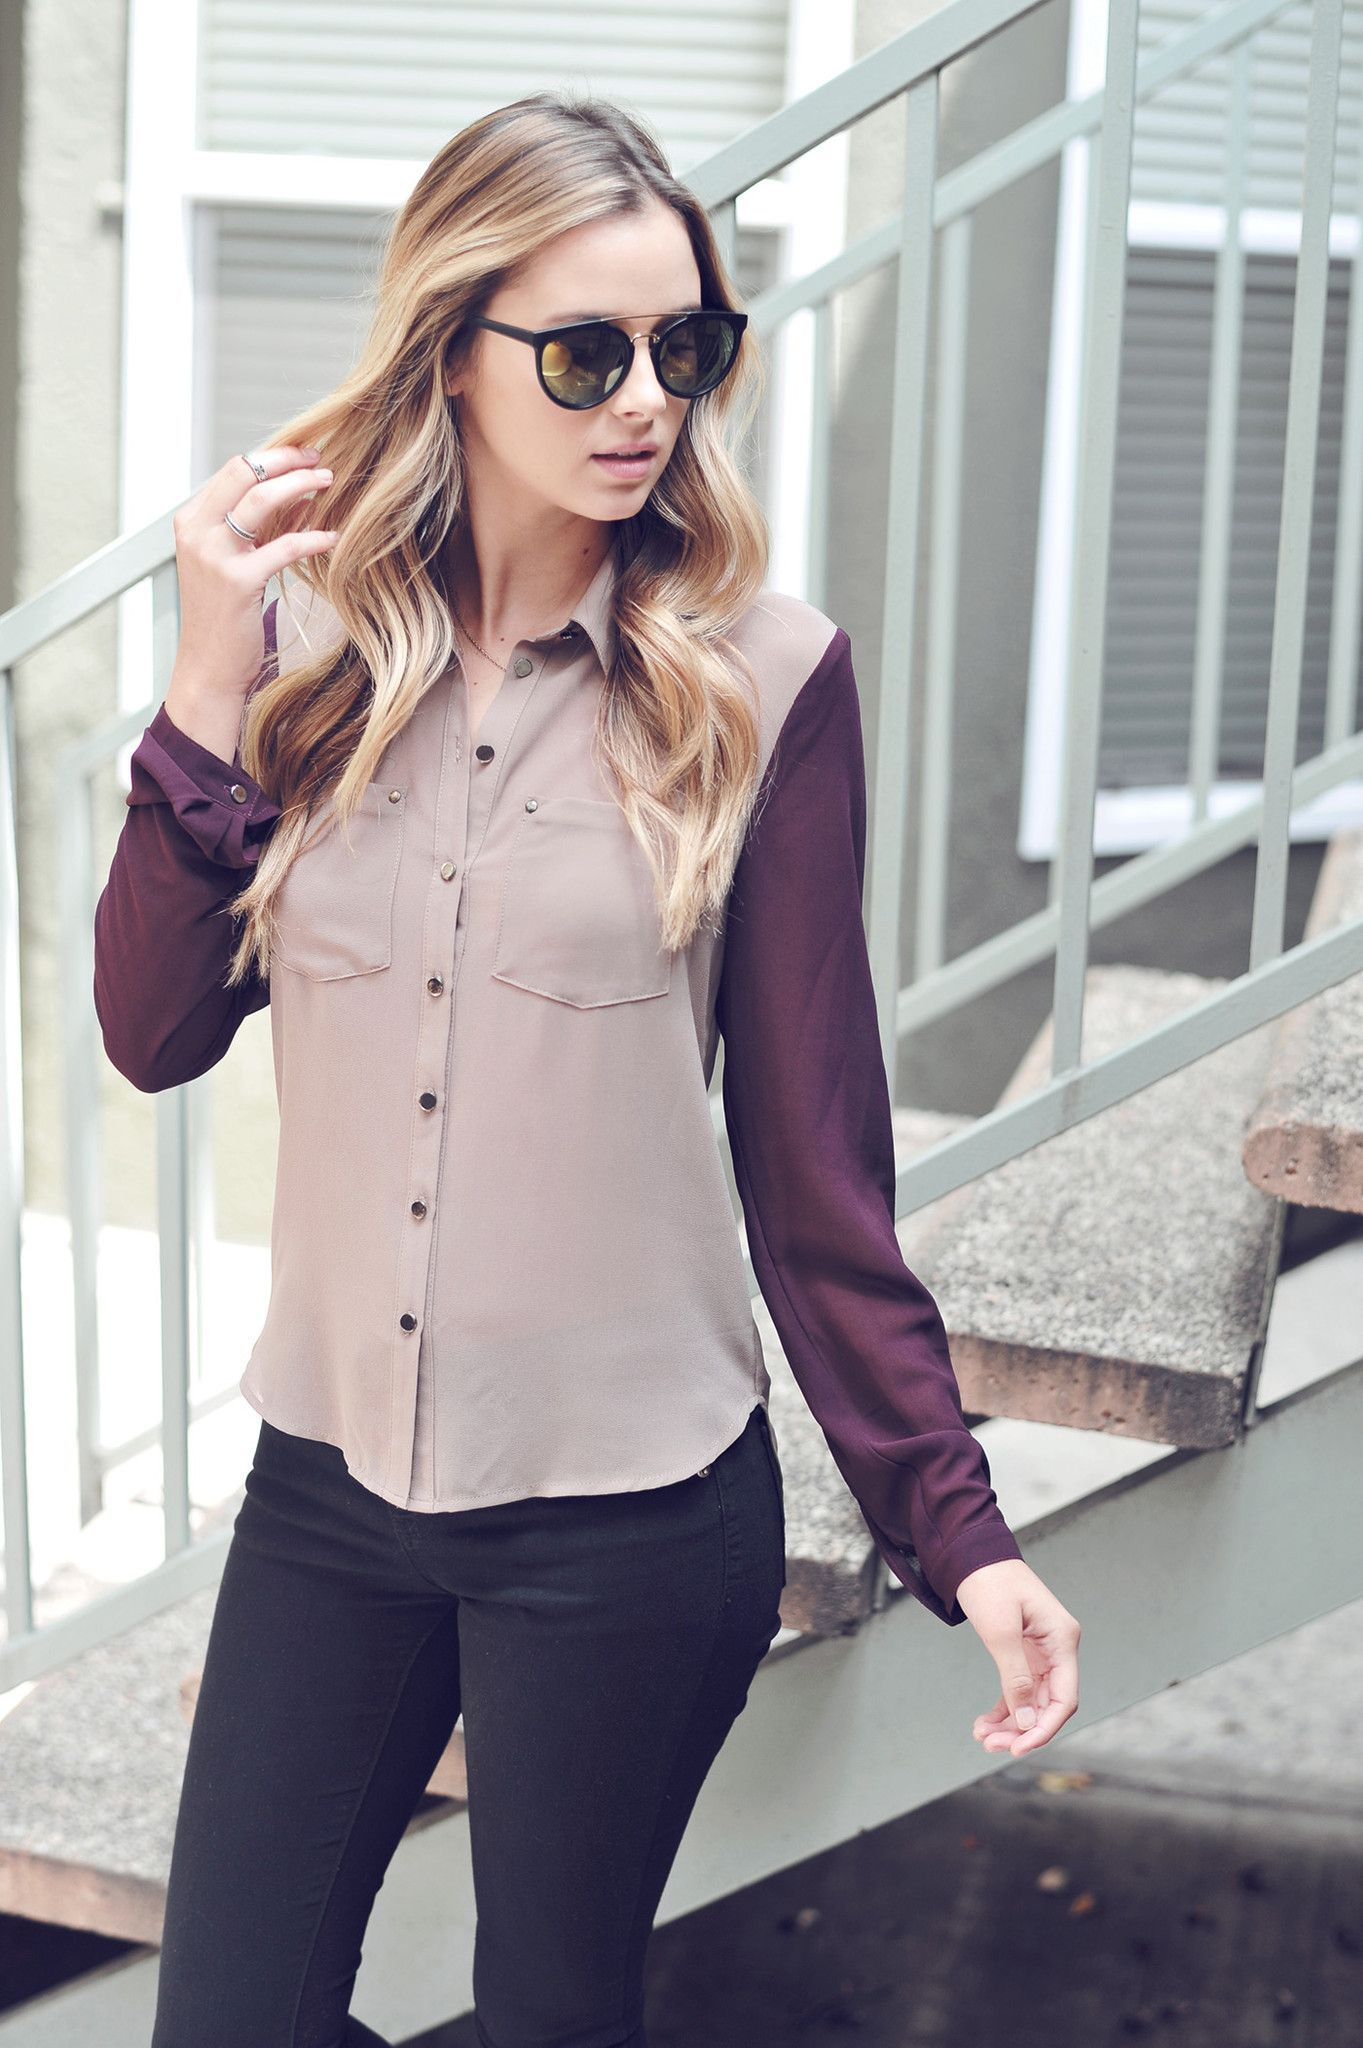 The Boomerang Purple Long Sleeve Top